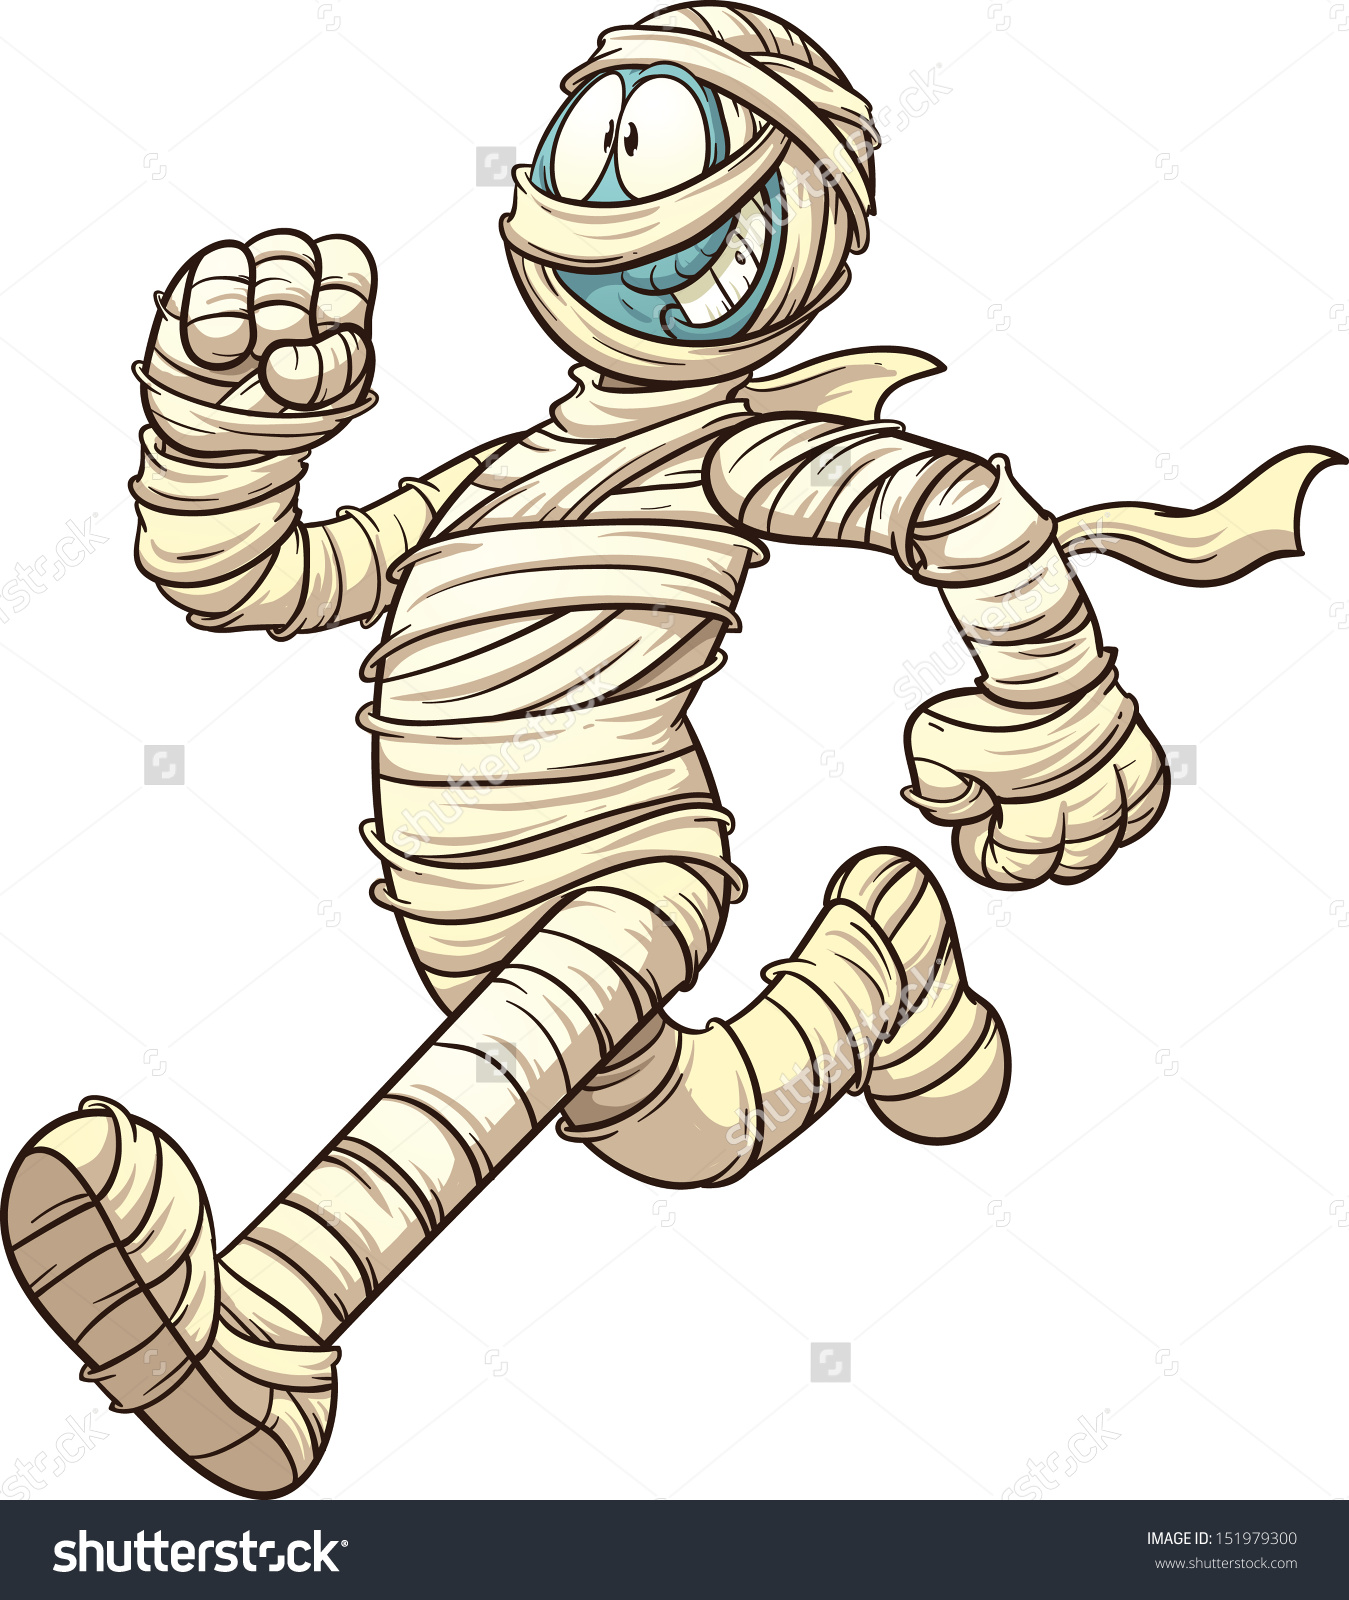 Name:  5852bb141e8504960edb153978502e7b_save-to-a-lightbox-running-mummy-clipart-for-kids_1349-1600.jpeg Views: 1 Size:  554.6 KB